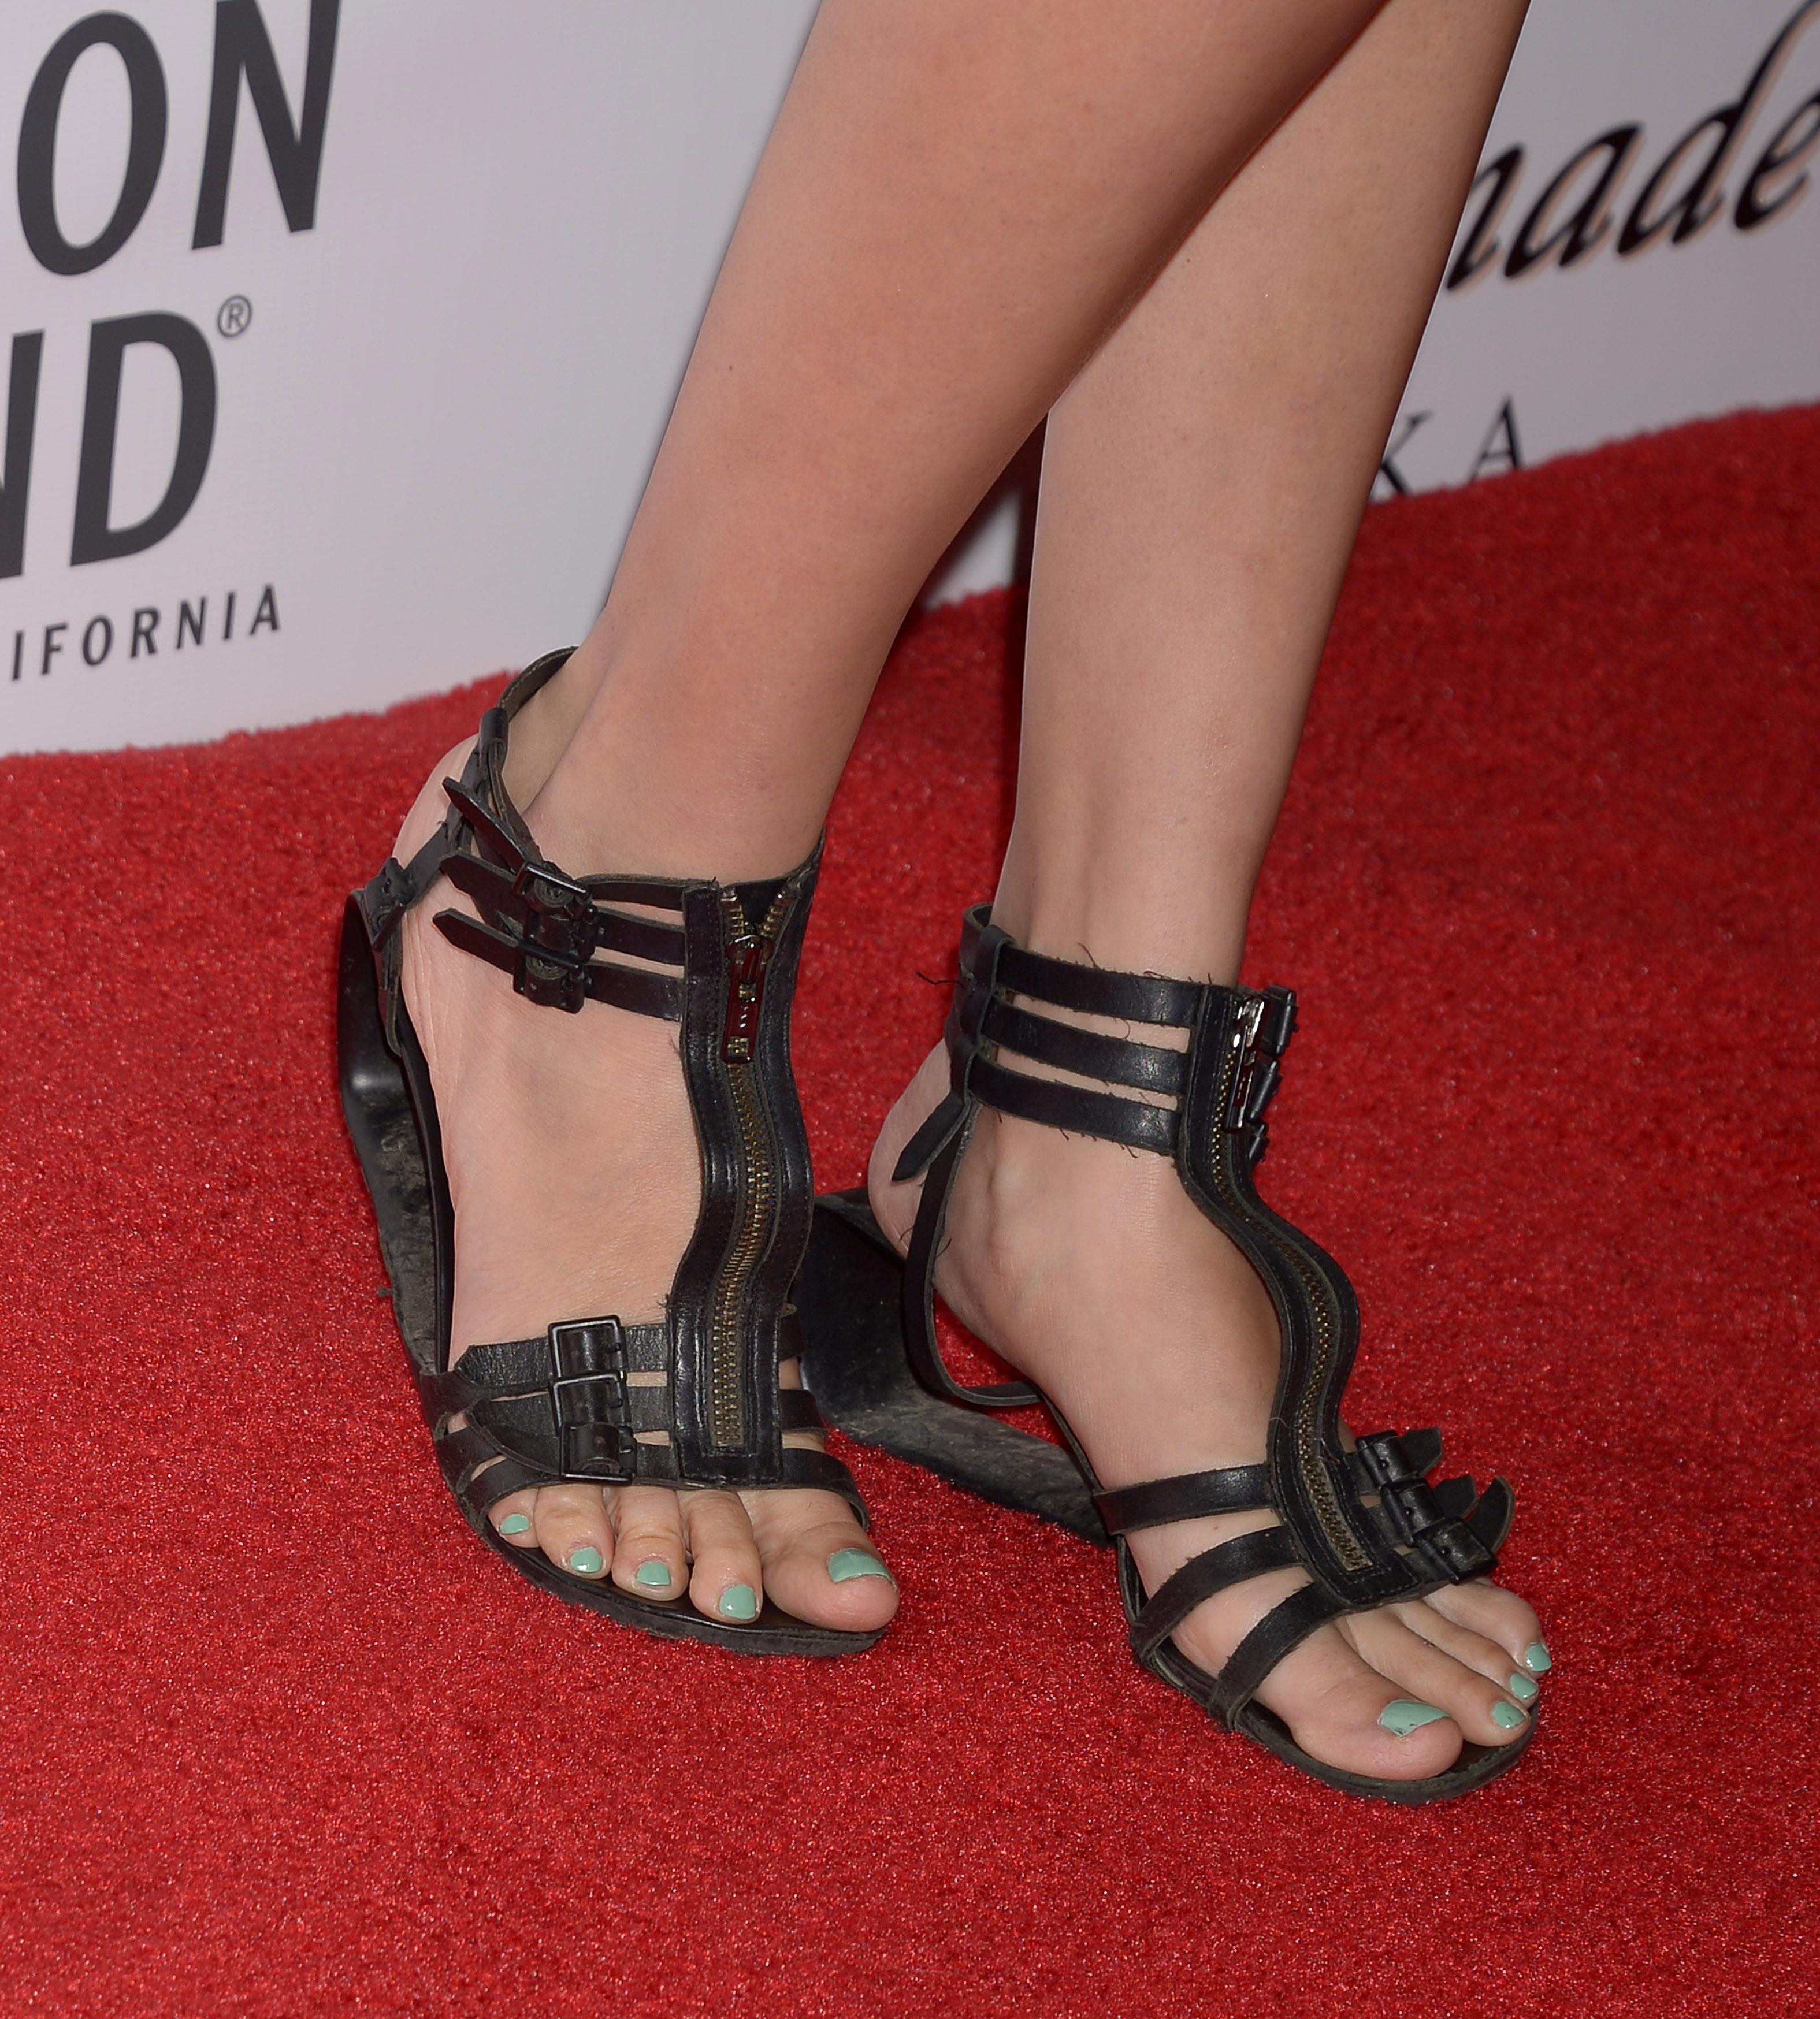 Maggie Graces Feet